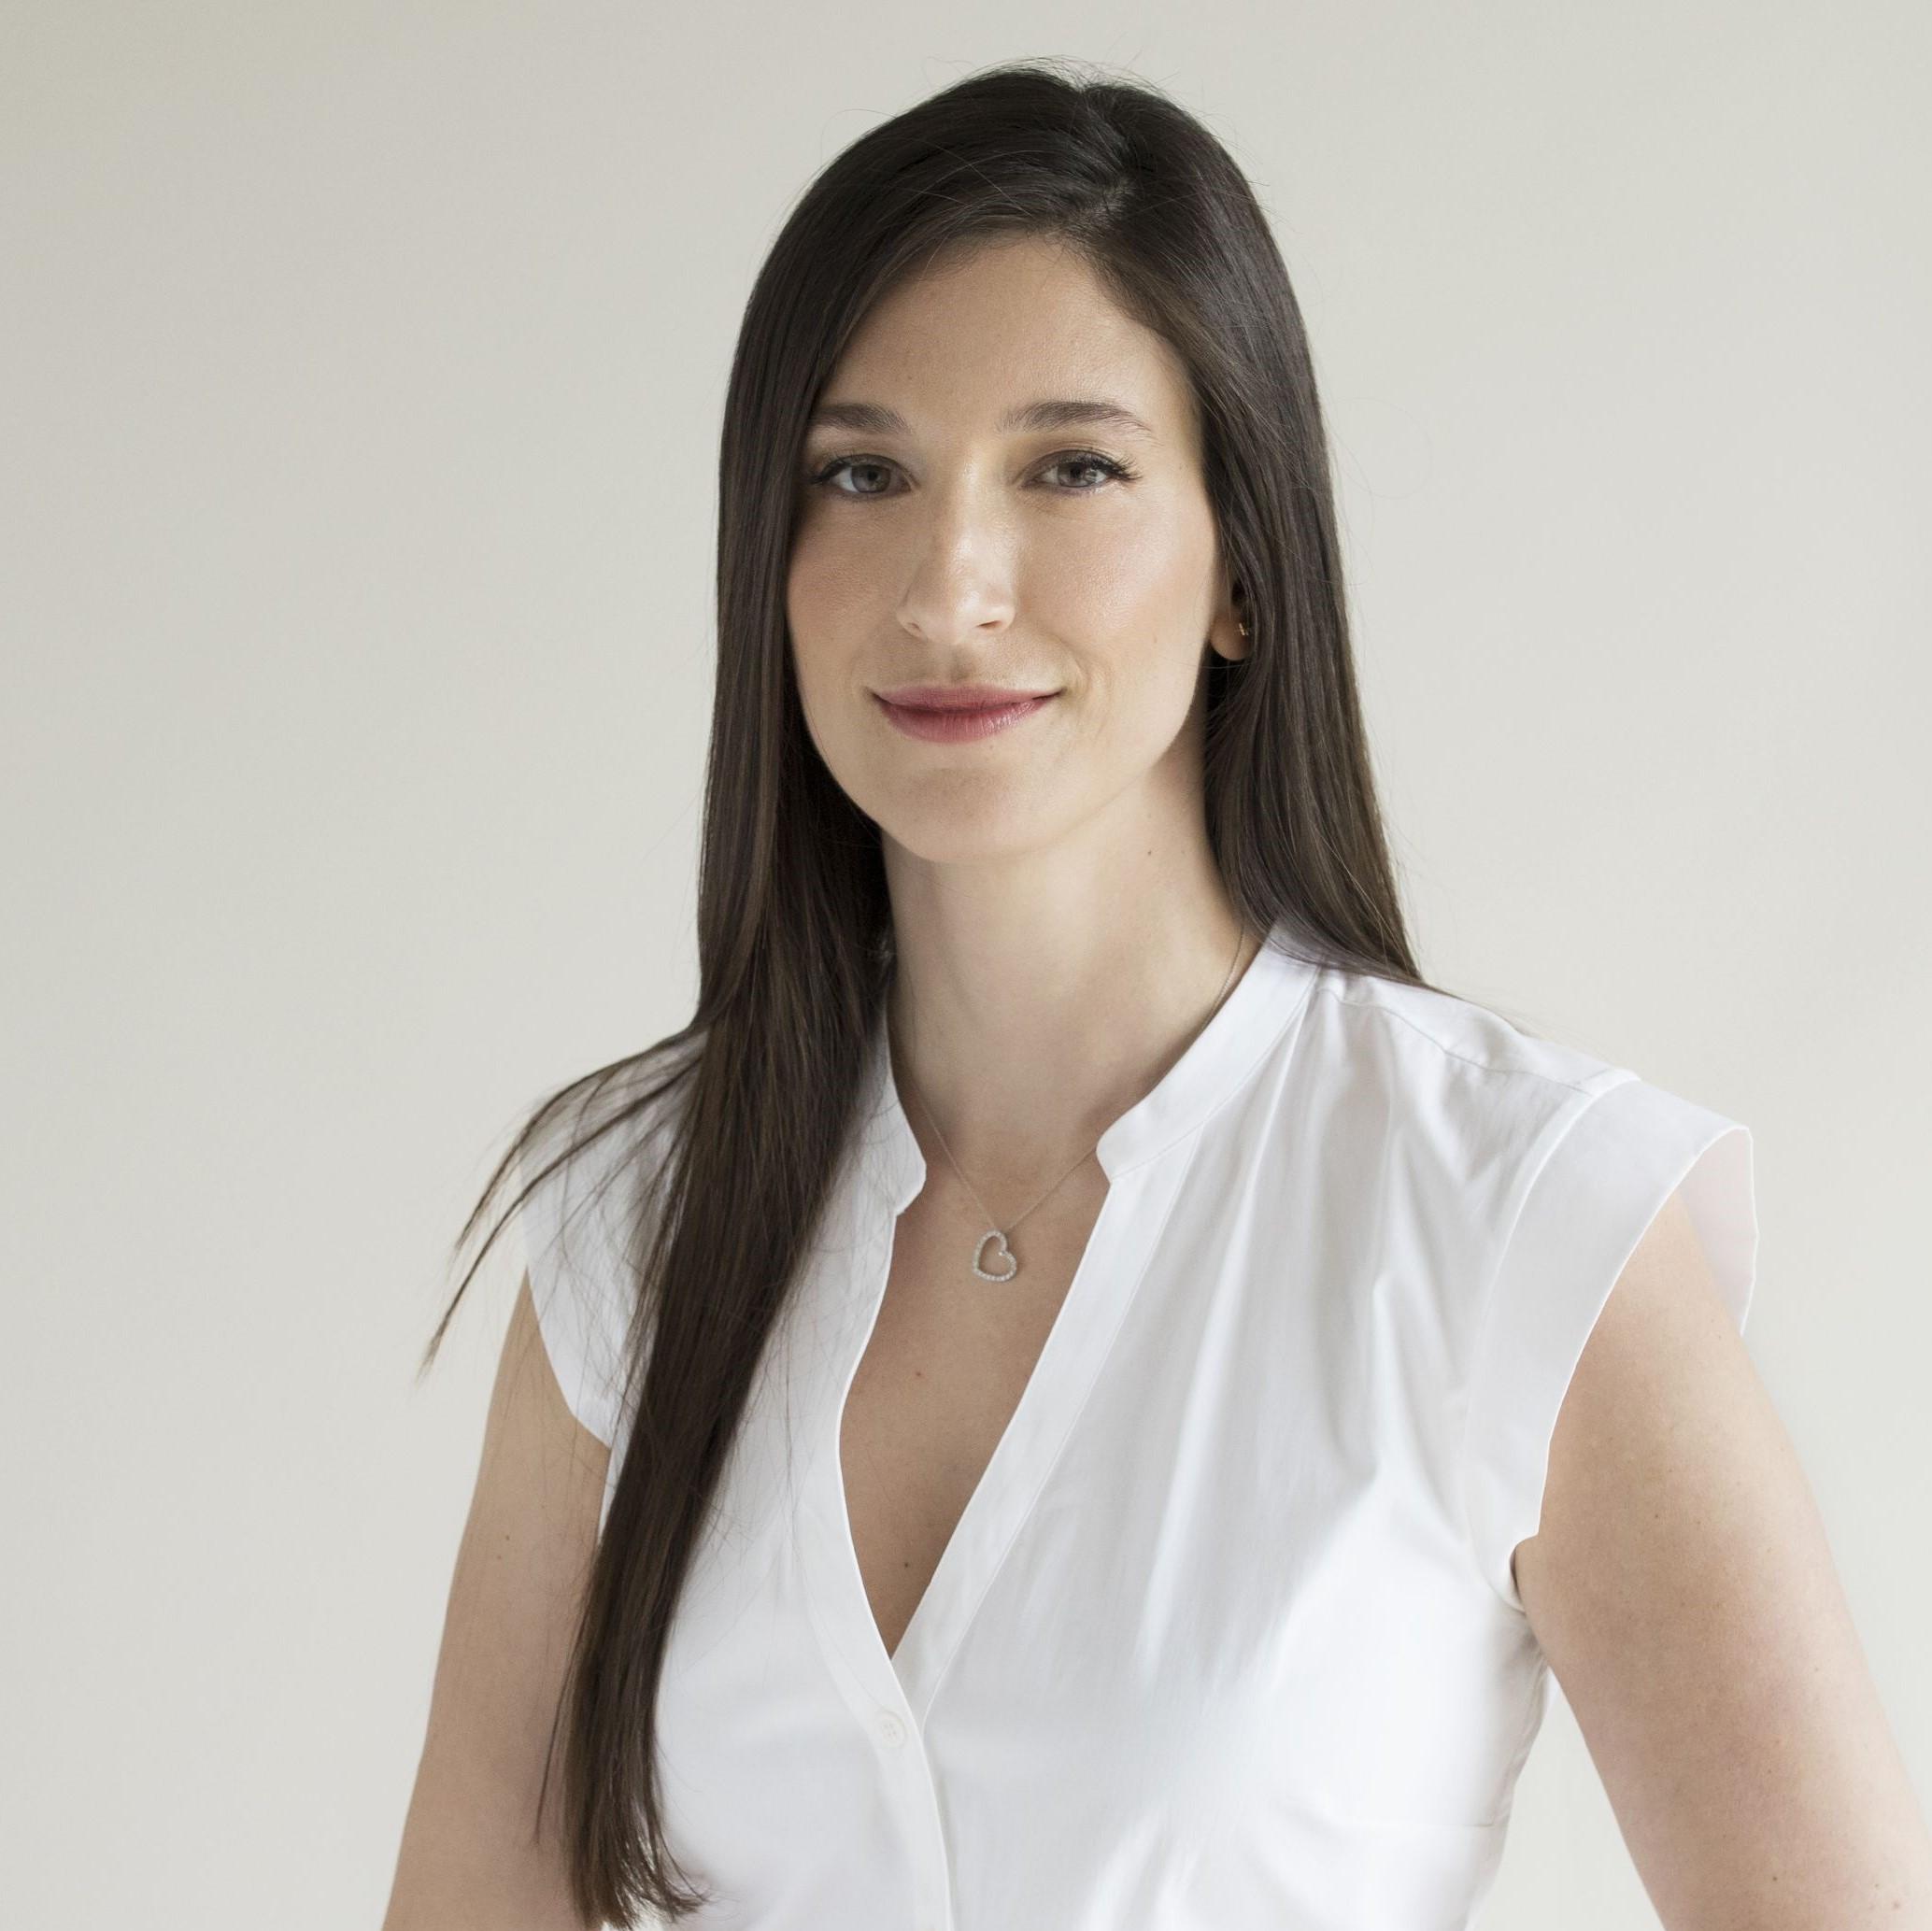 Gina Ciraldo Stabile (Past Chair) image